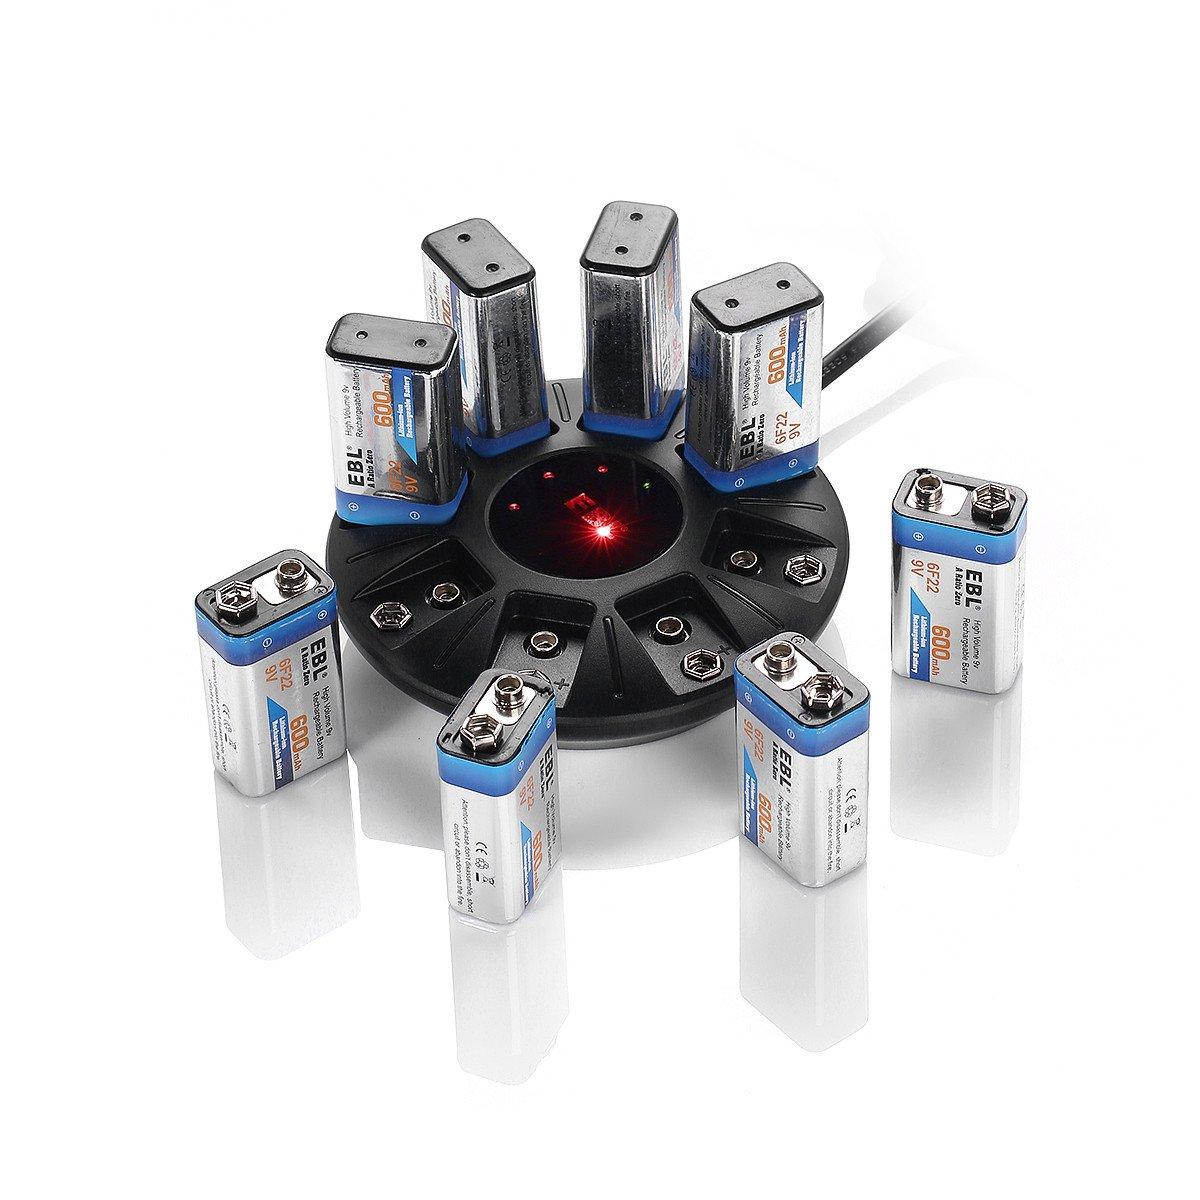 EBL 8 Stecker Akku Ladegerät für 9 V Block Li-ion Wiederaufladbare Akkus